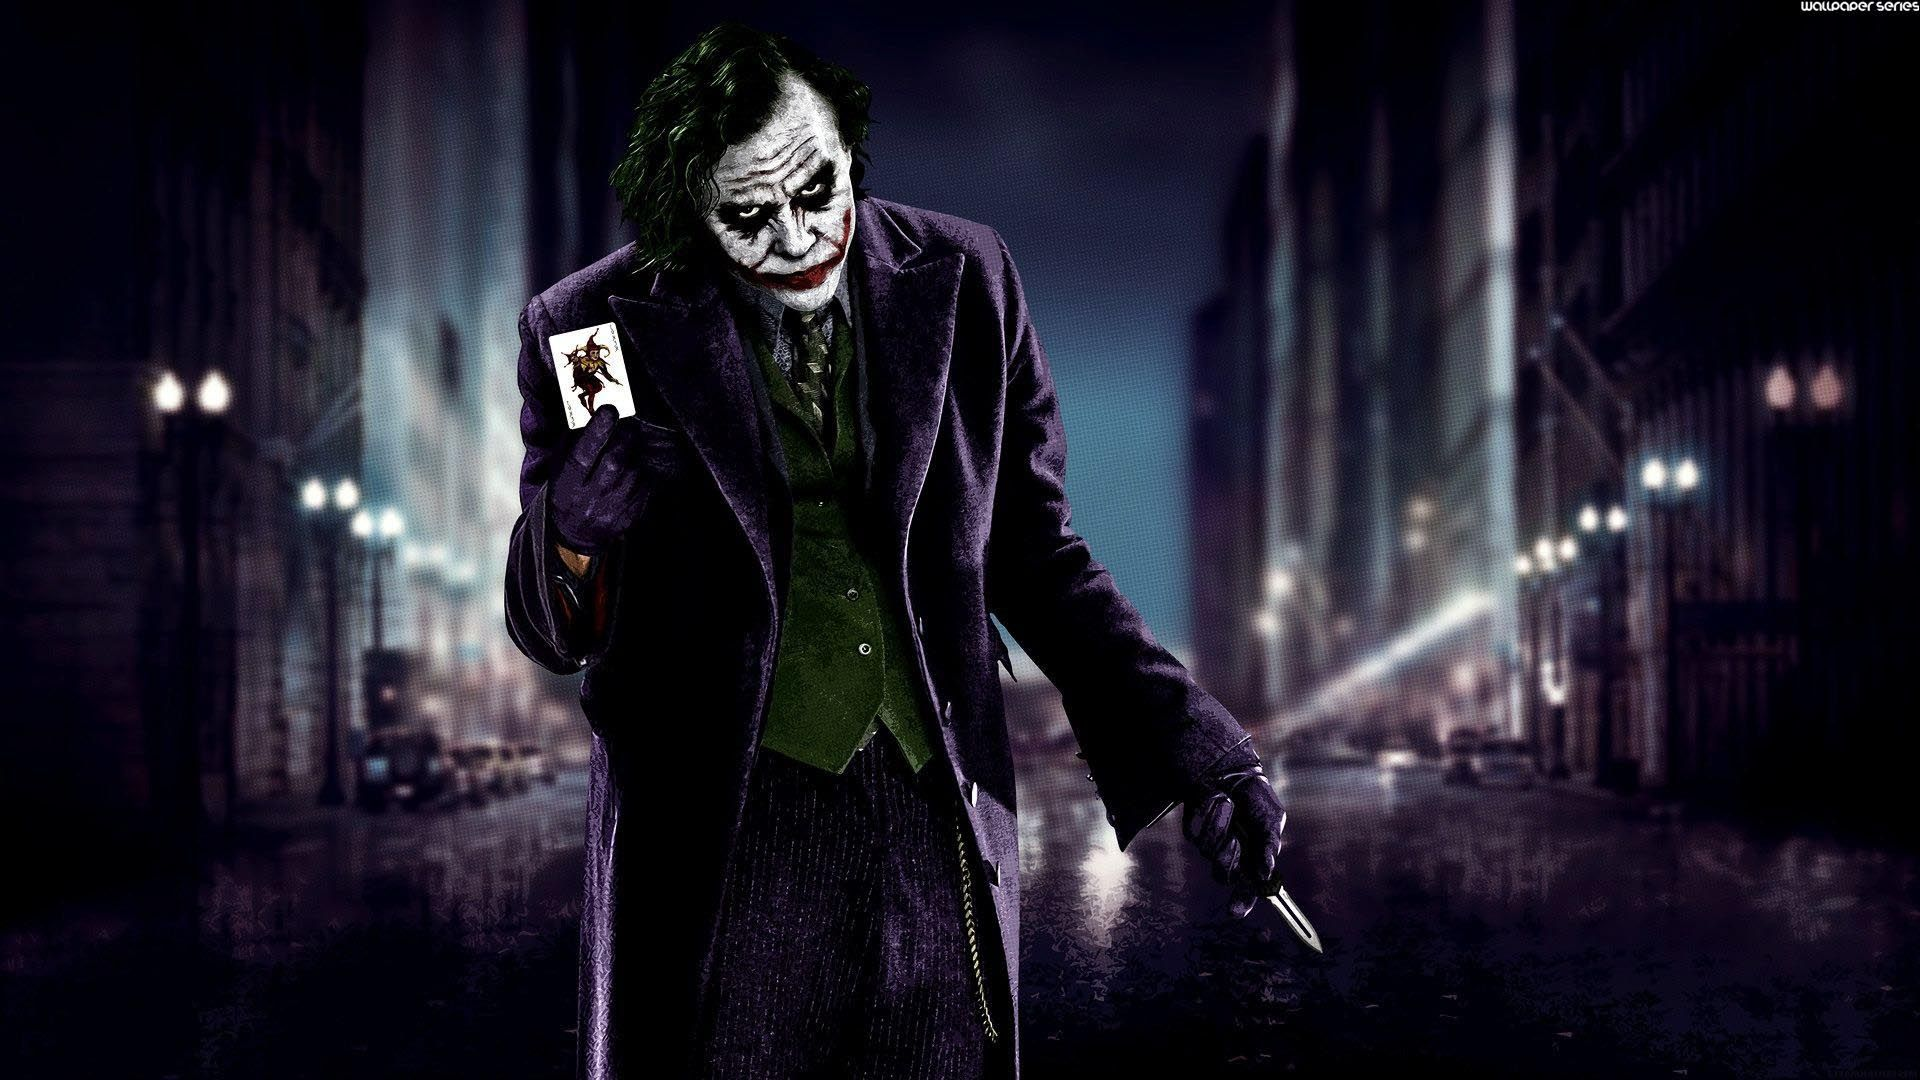 Dark Knight Joker Backgrounds For Desktop Wallpaper On Flipwallpapers Com Dark Knight Joker In 2020 Joker Wallpapers Joker Background Heath Ledger Joker Wallpaper Dark knight horror joker wallpaper hd